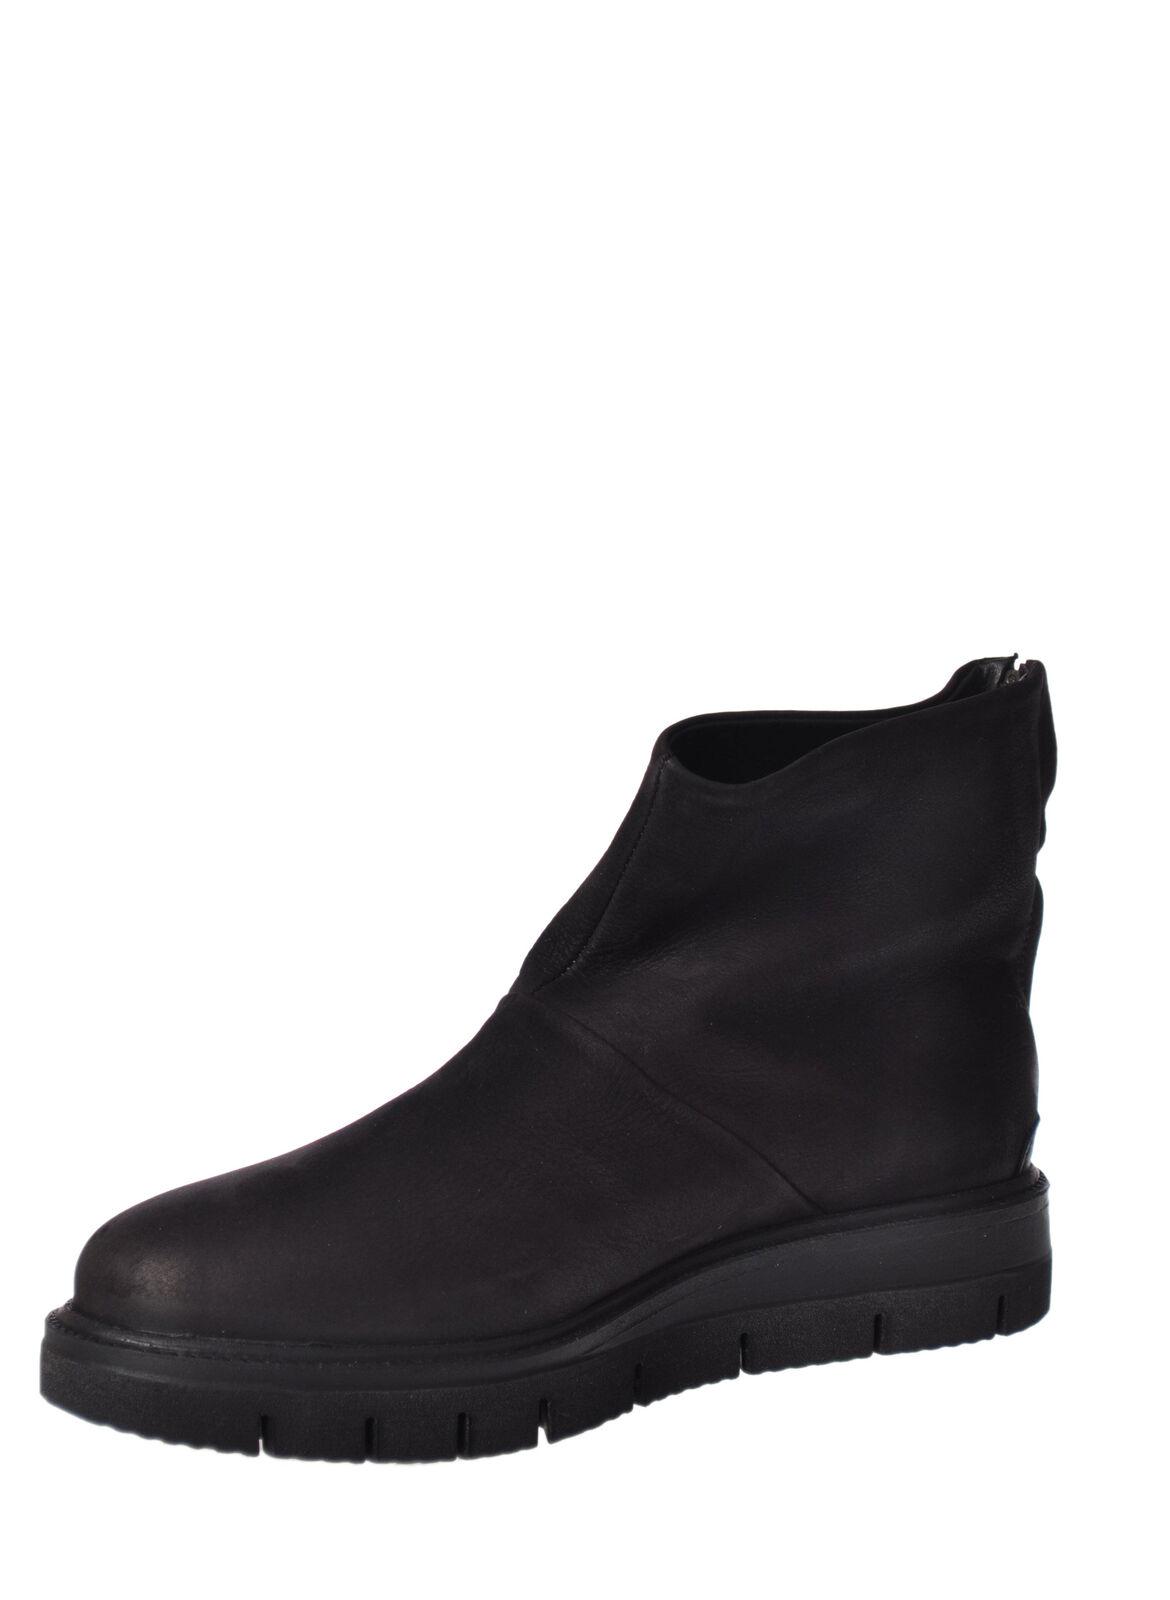 Lemarè - zapatos-Stivaletti - mujer mujer - - negro - 450915C184109 ec075f